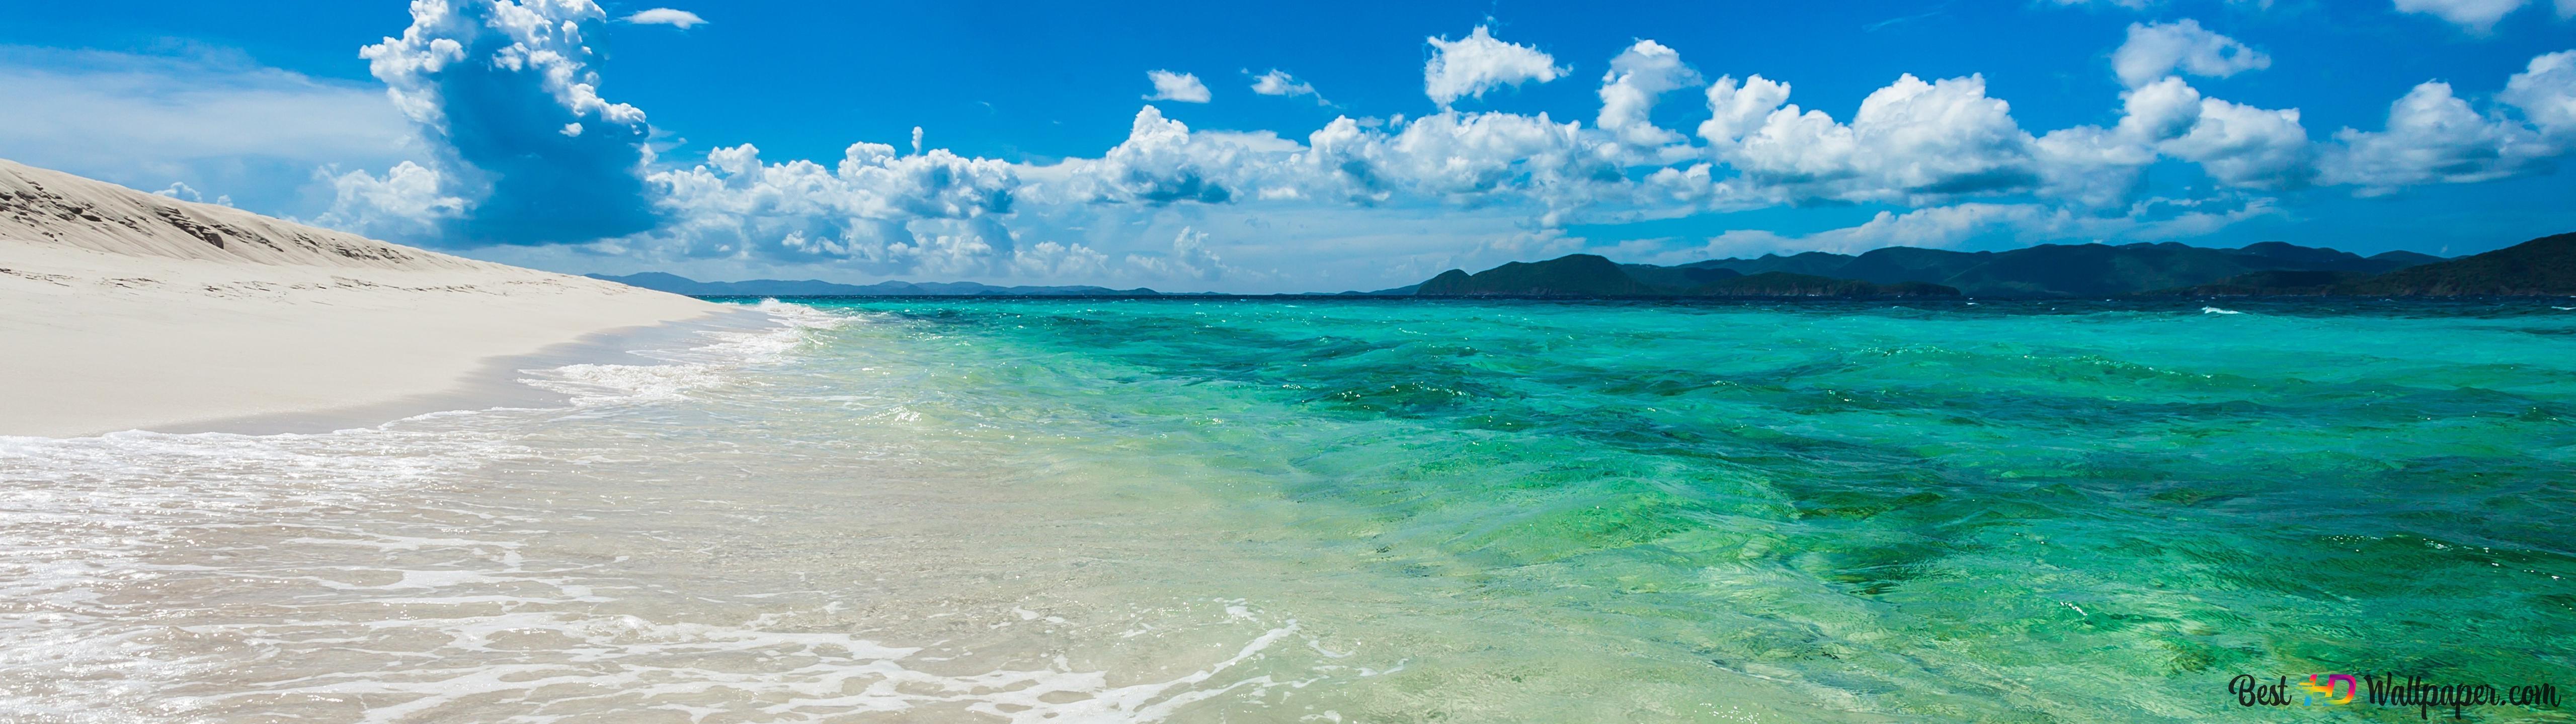 Beautiful Ocean Background View Hd Wallpaper Download